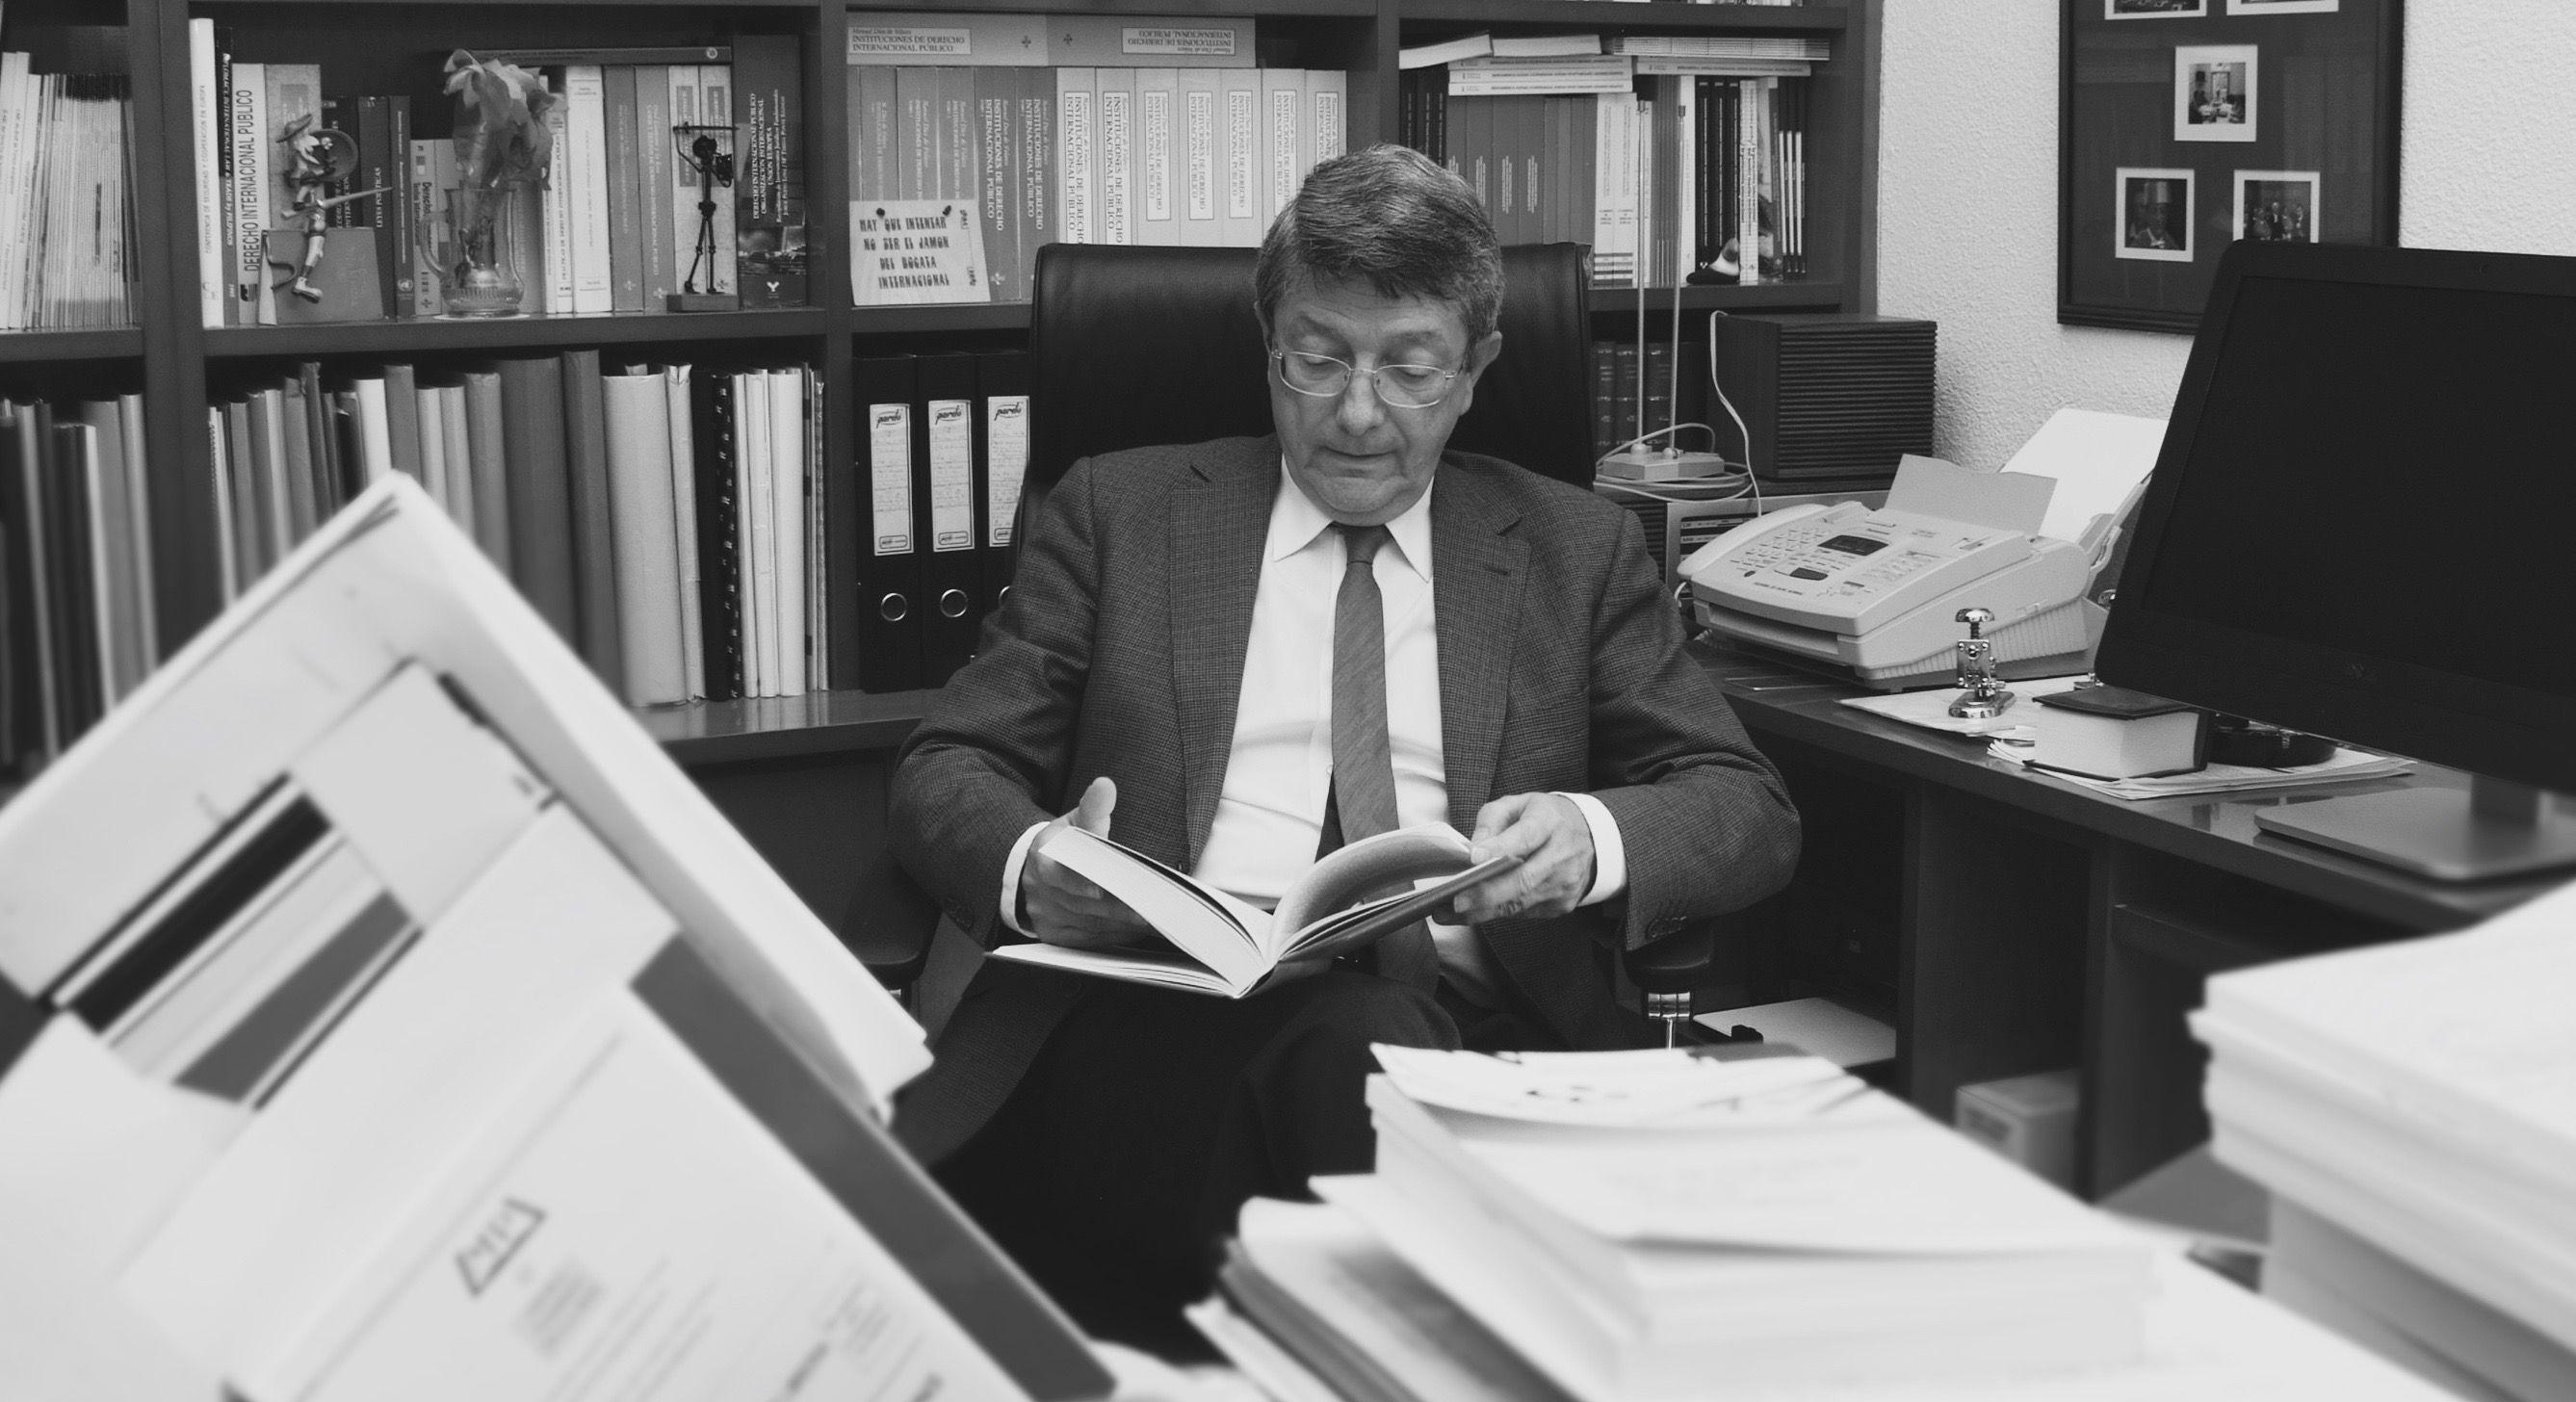 Dr. Dr. Carlos Jimenez Piernas